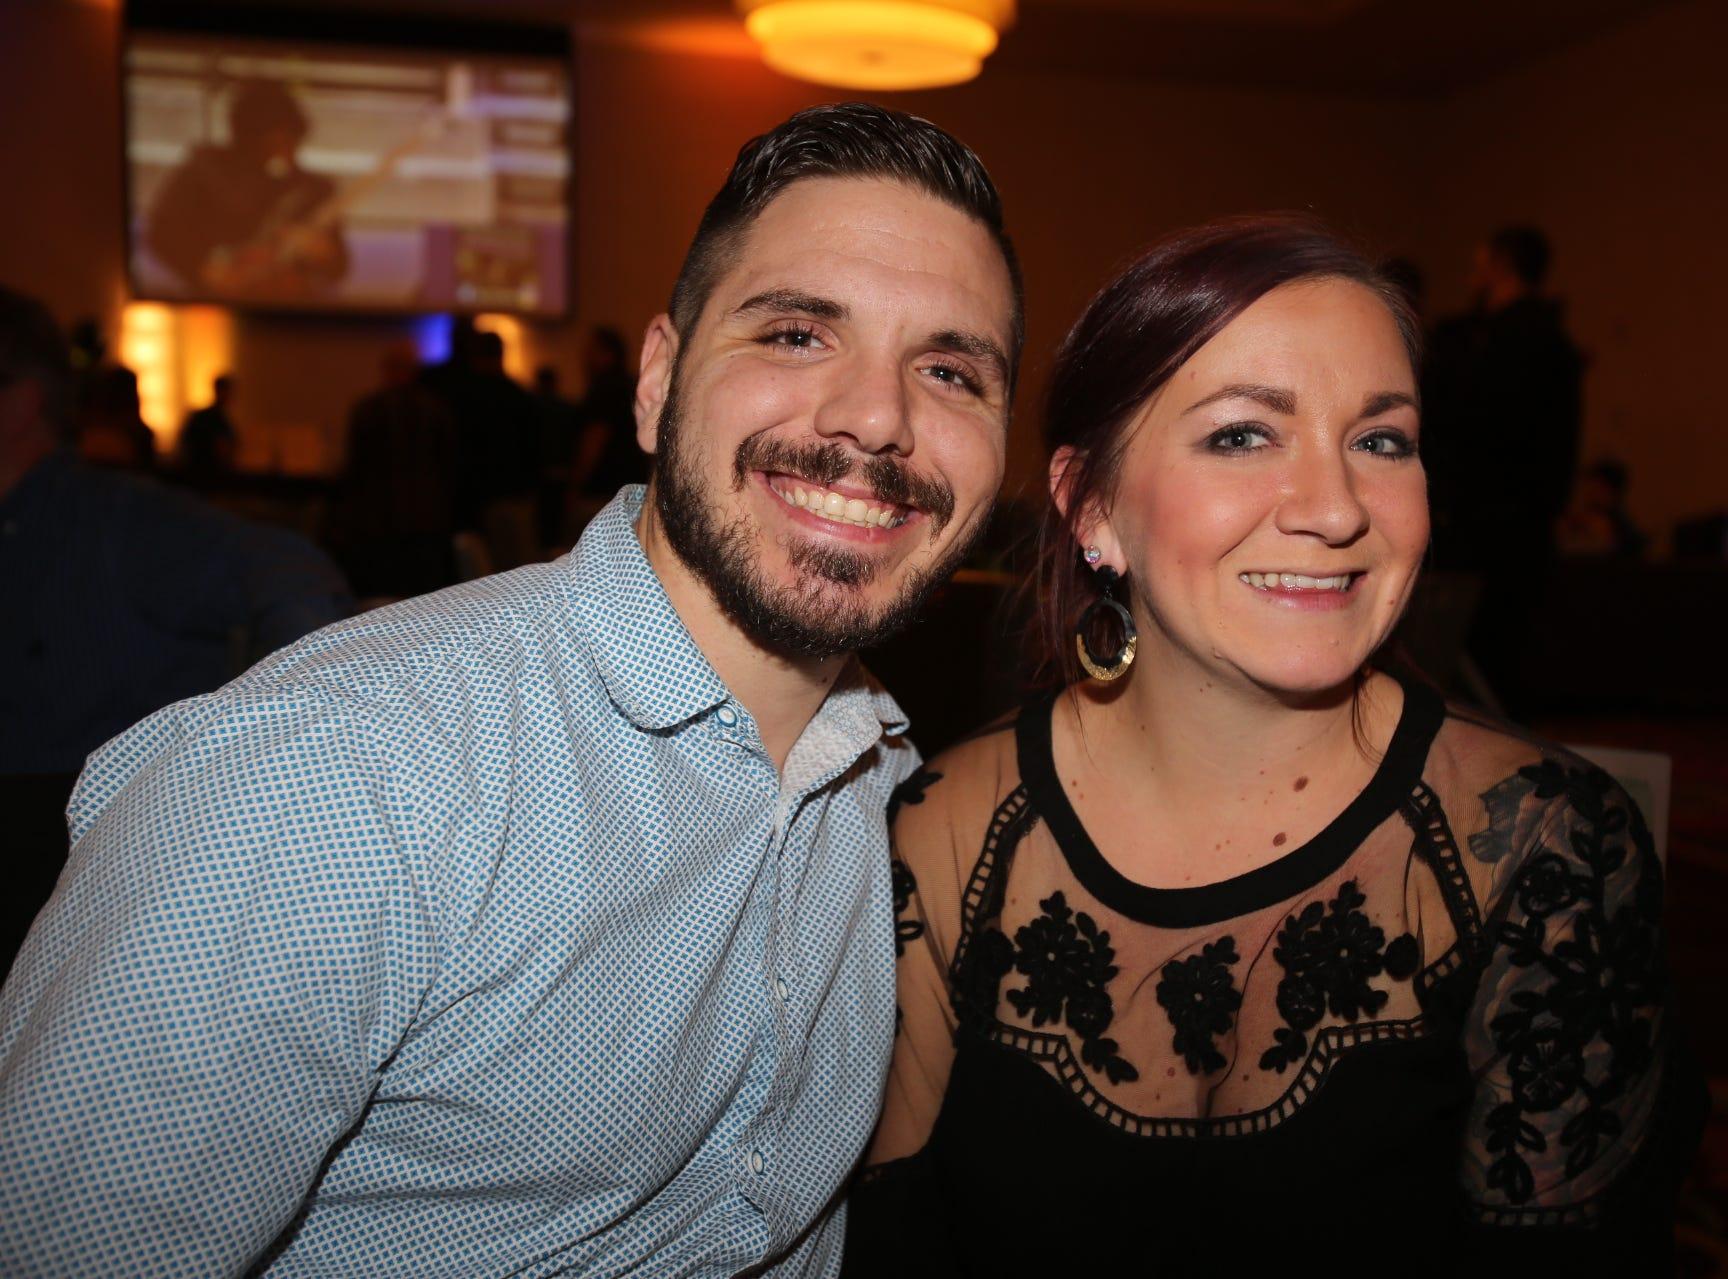 Shawn and Ashley Stacye